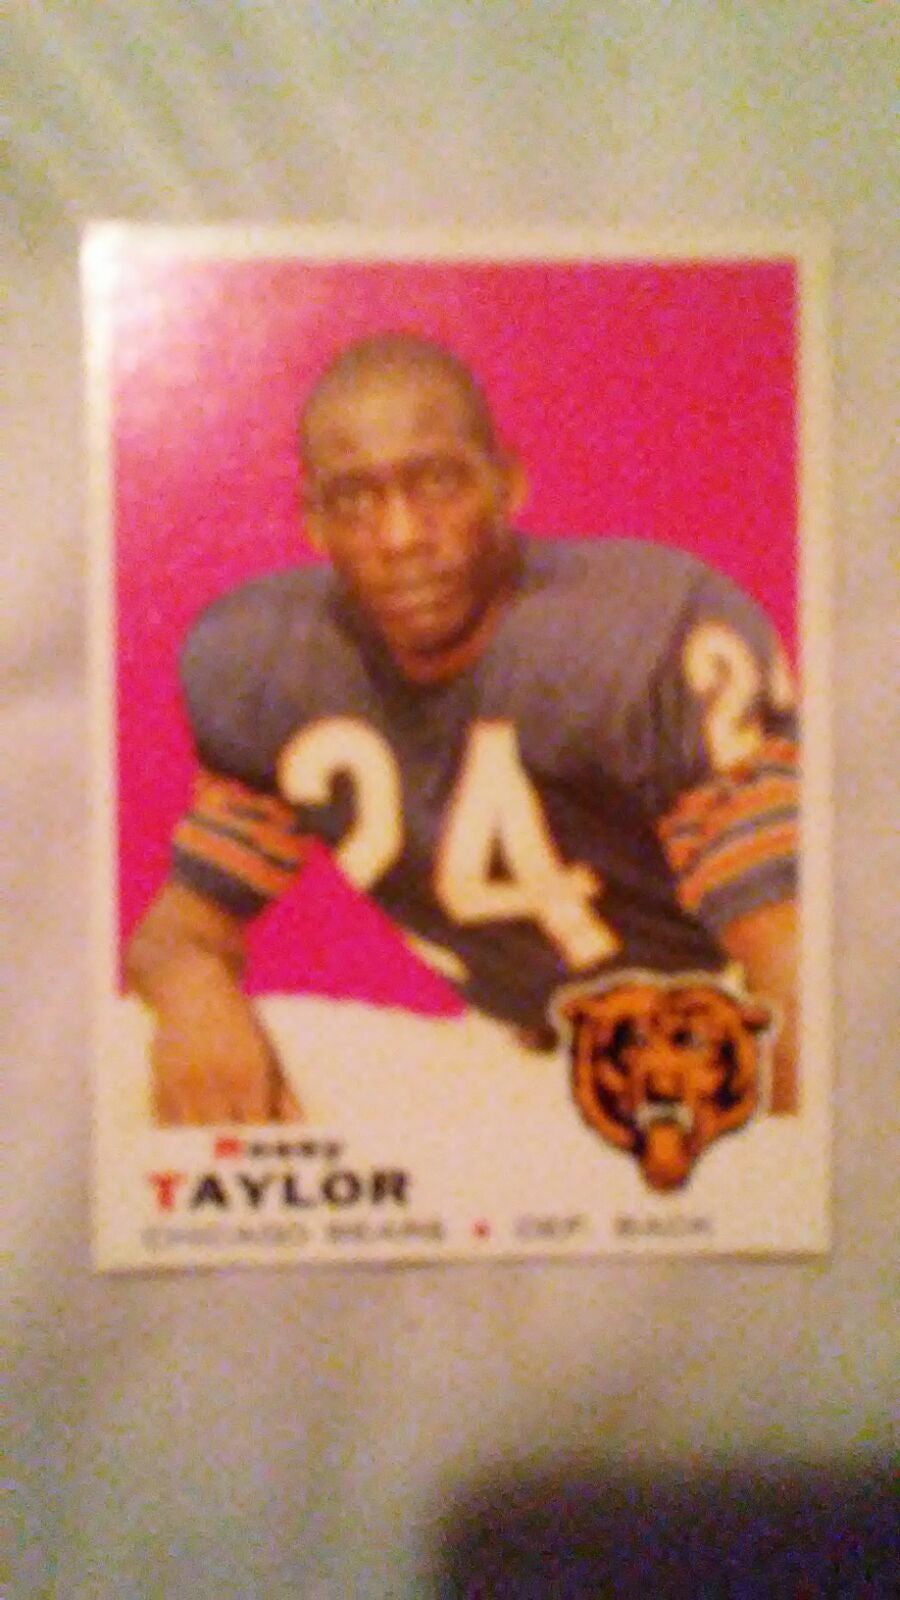 1969 Rosey Taylor football card